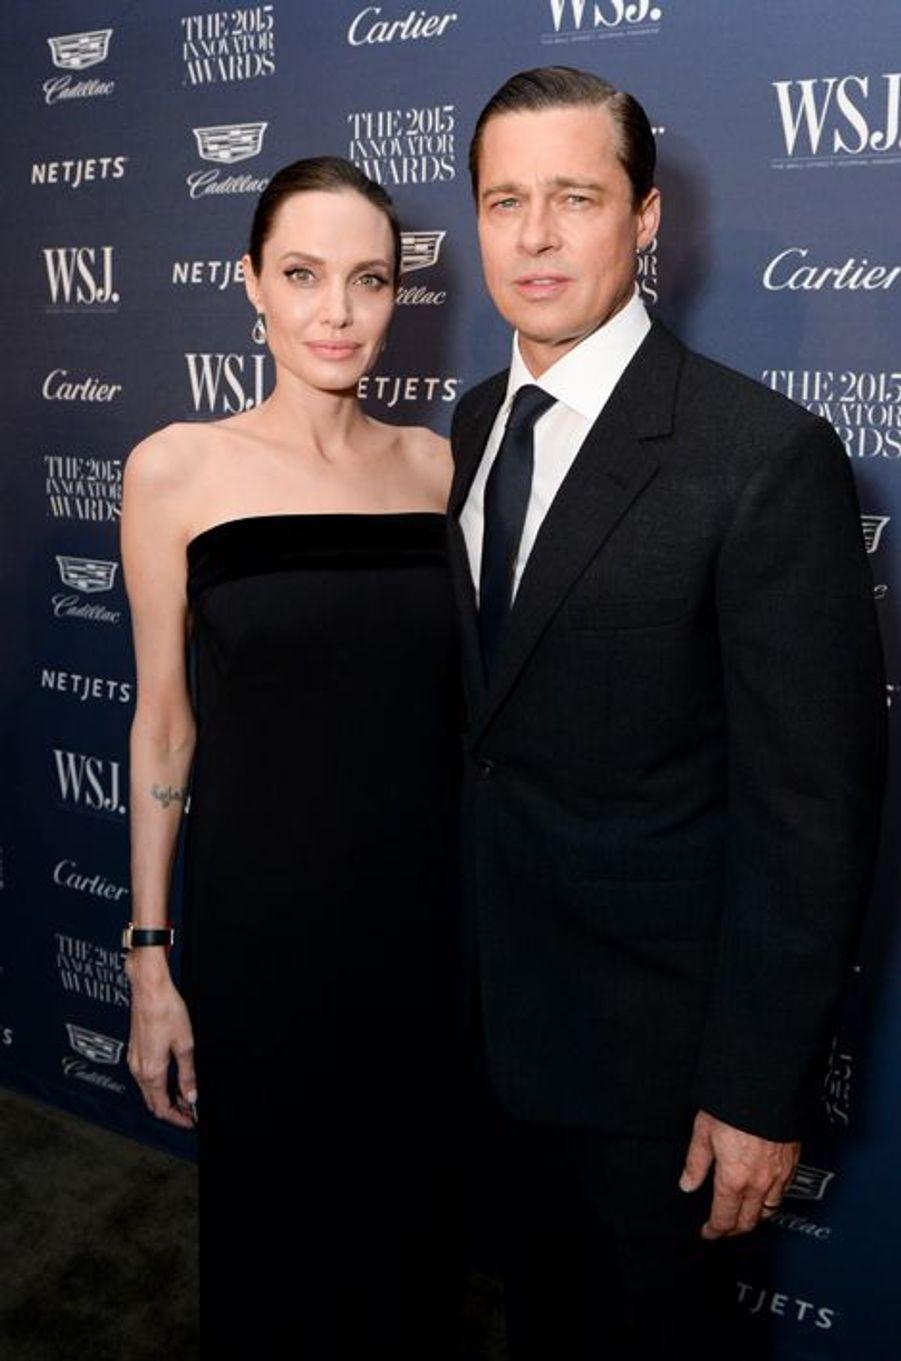 Angelina Jolie et Brad Pitt à New York le 4 novembre 2015